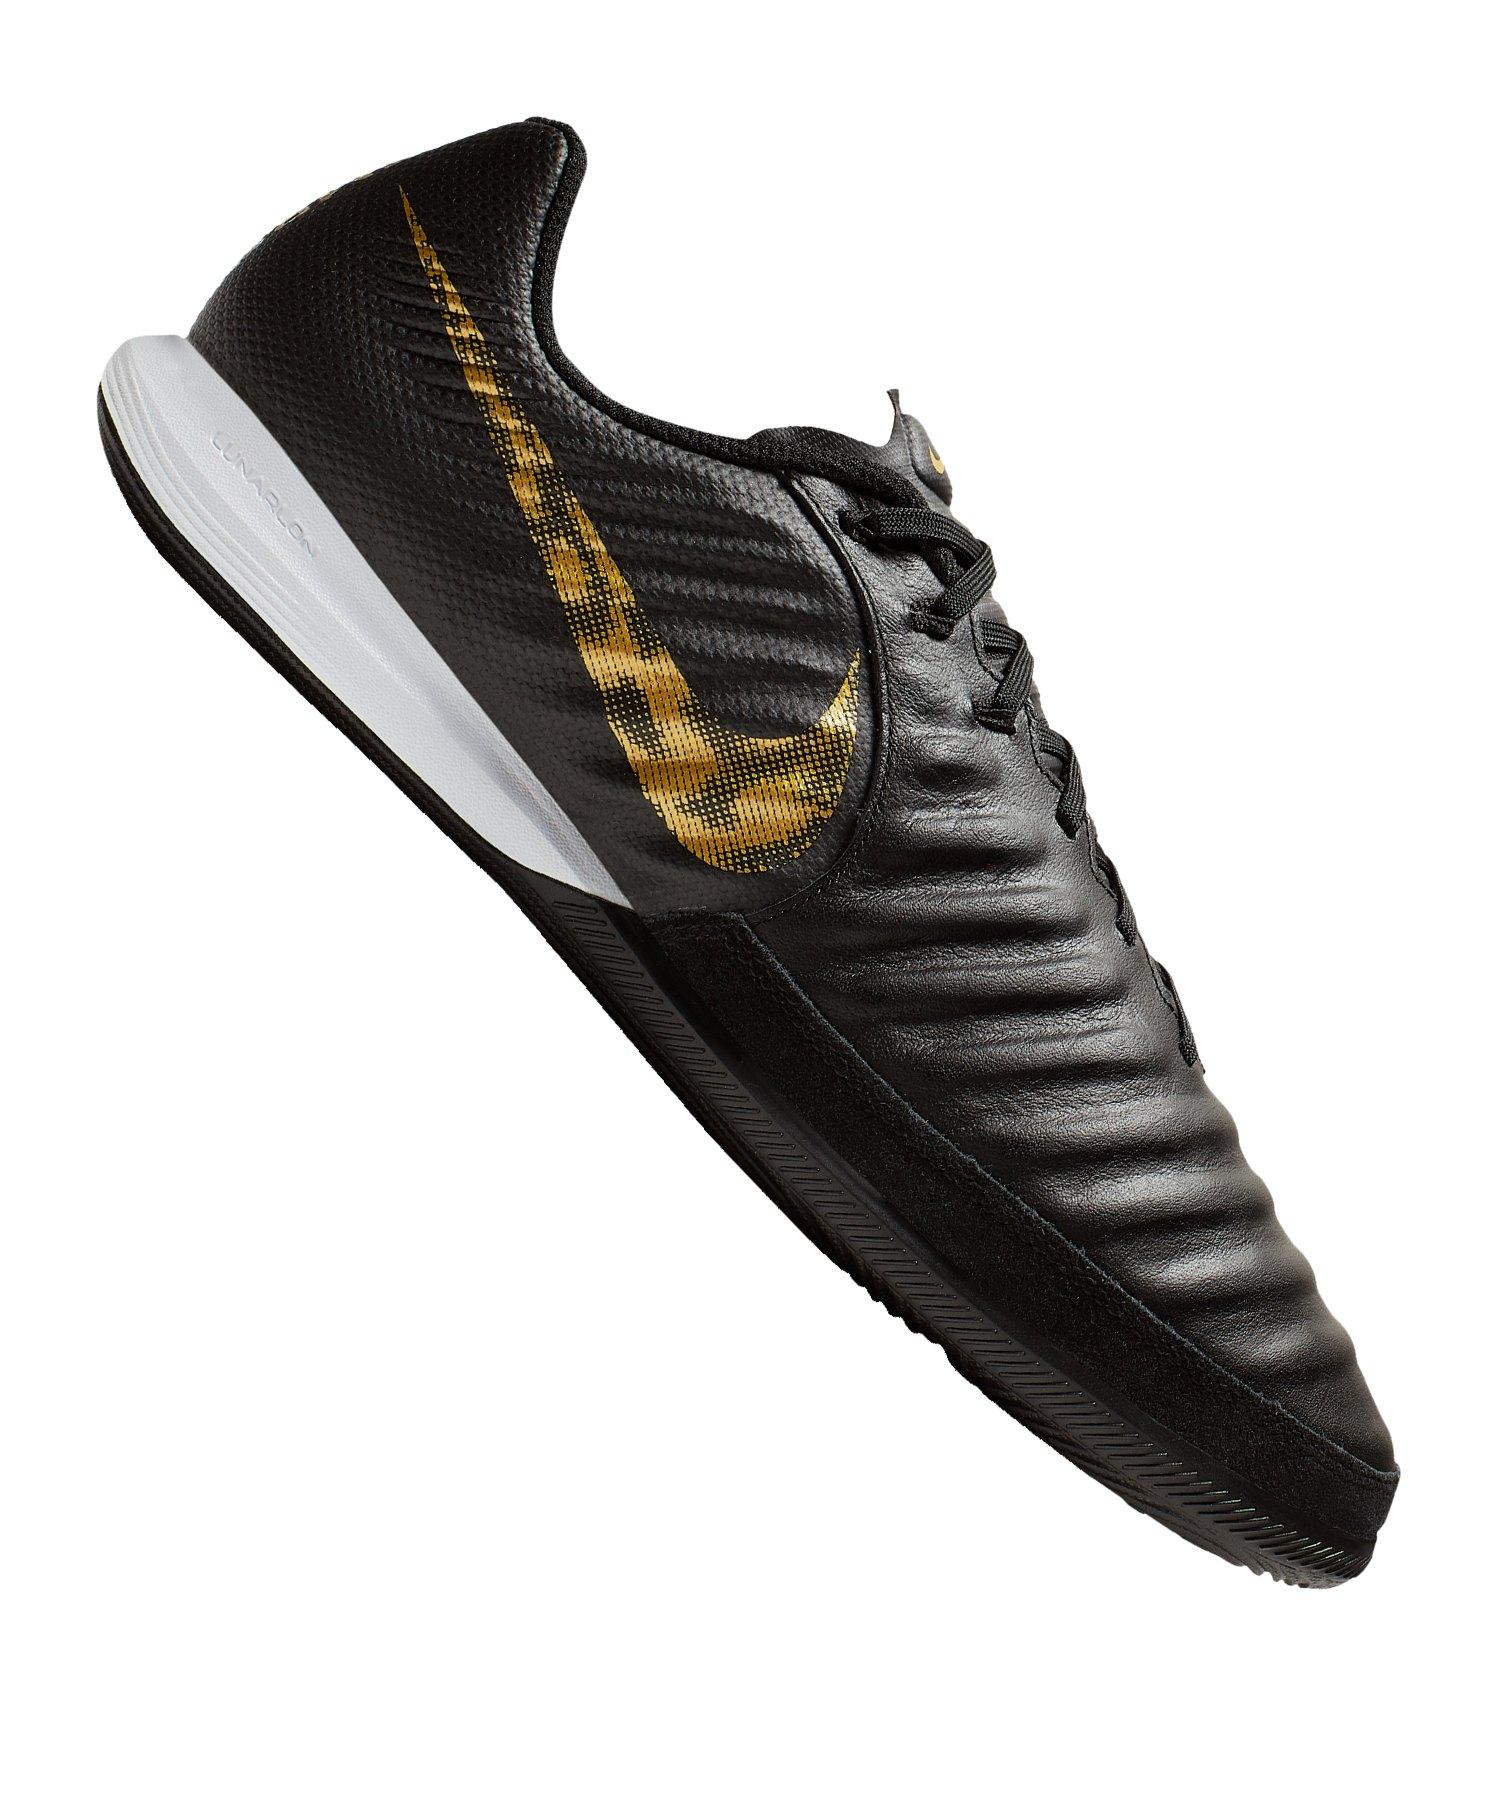 f65de13028f5 Nike Tiempo LegendX VII Pro IC Schwarz Gold F077  Indoorschuh ...